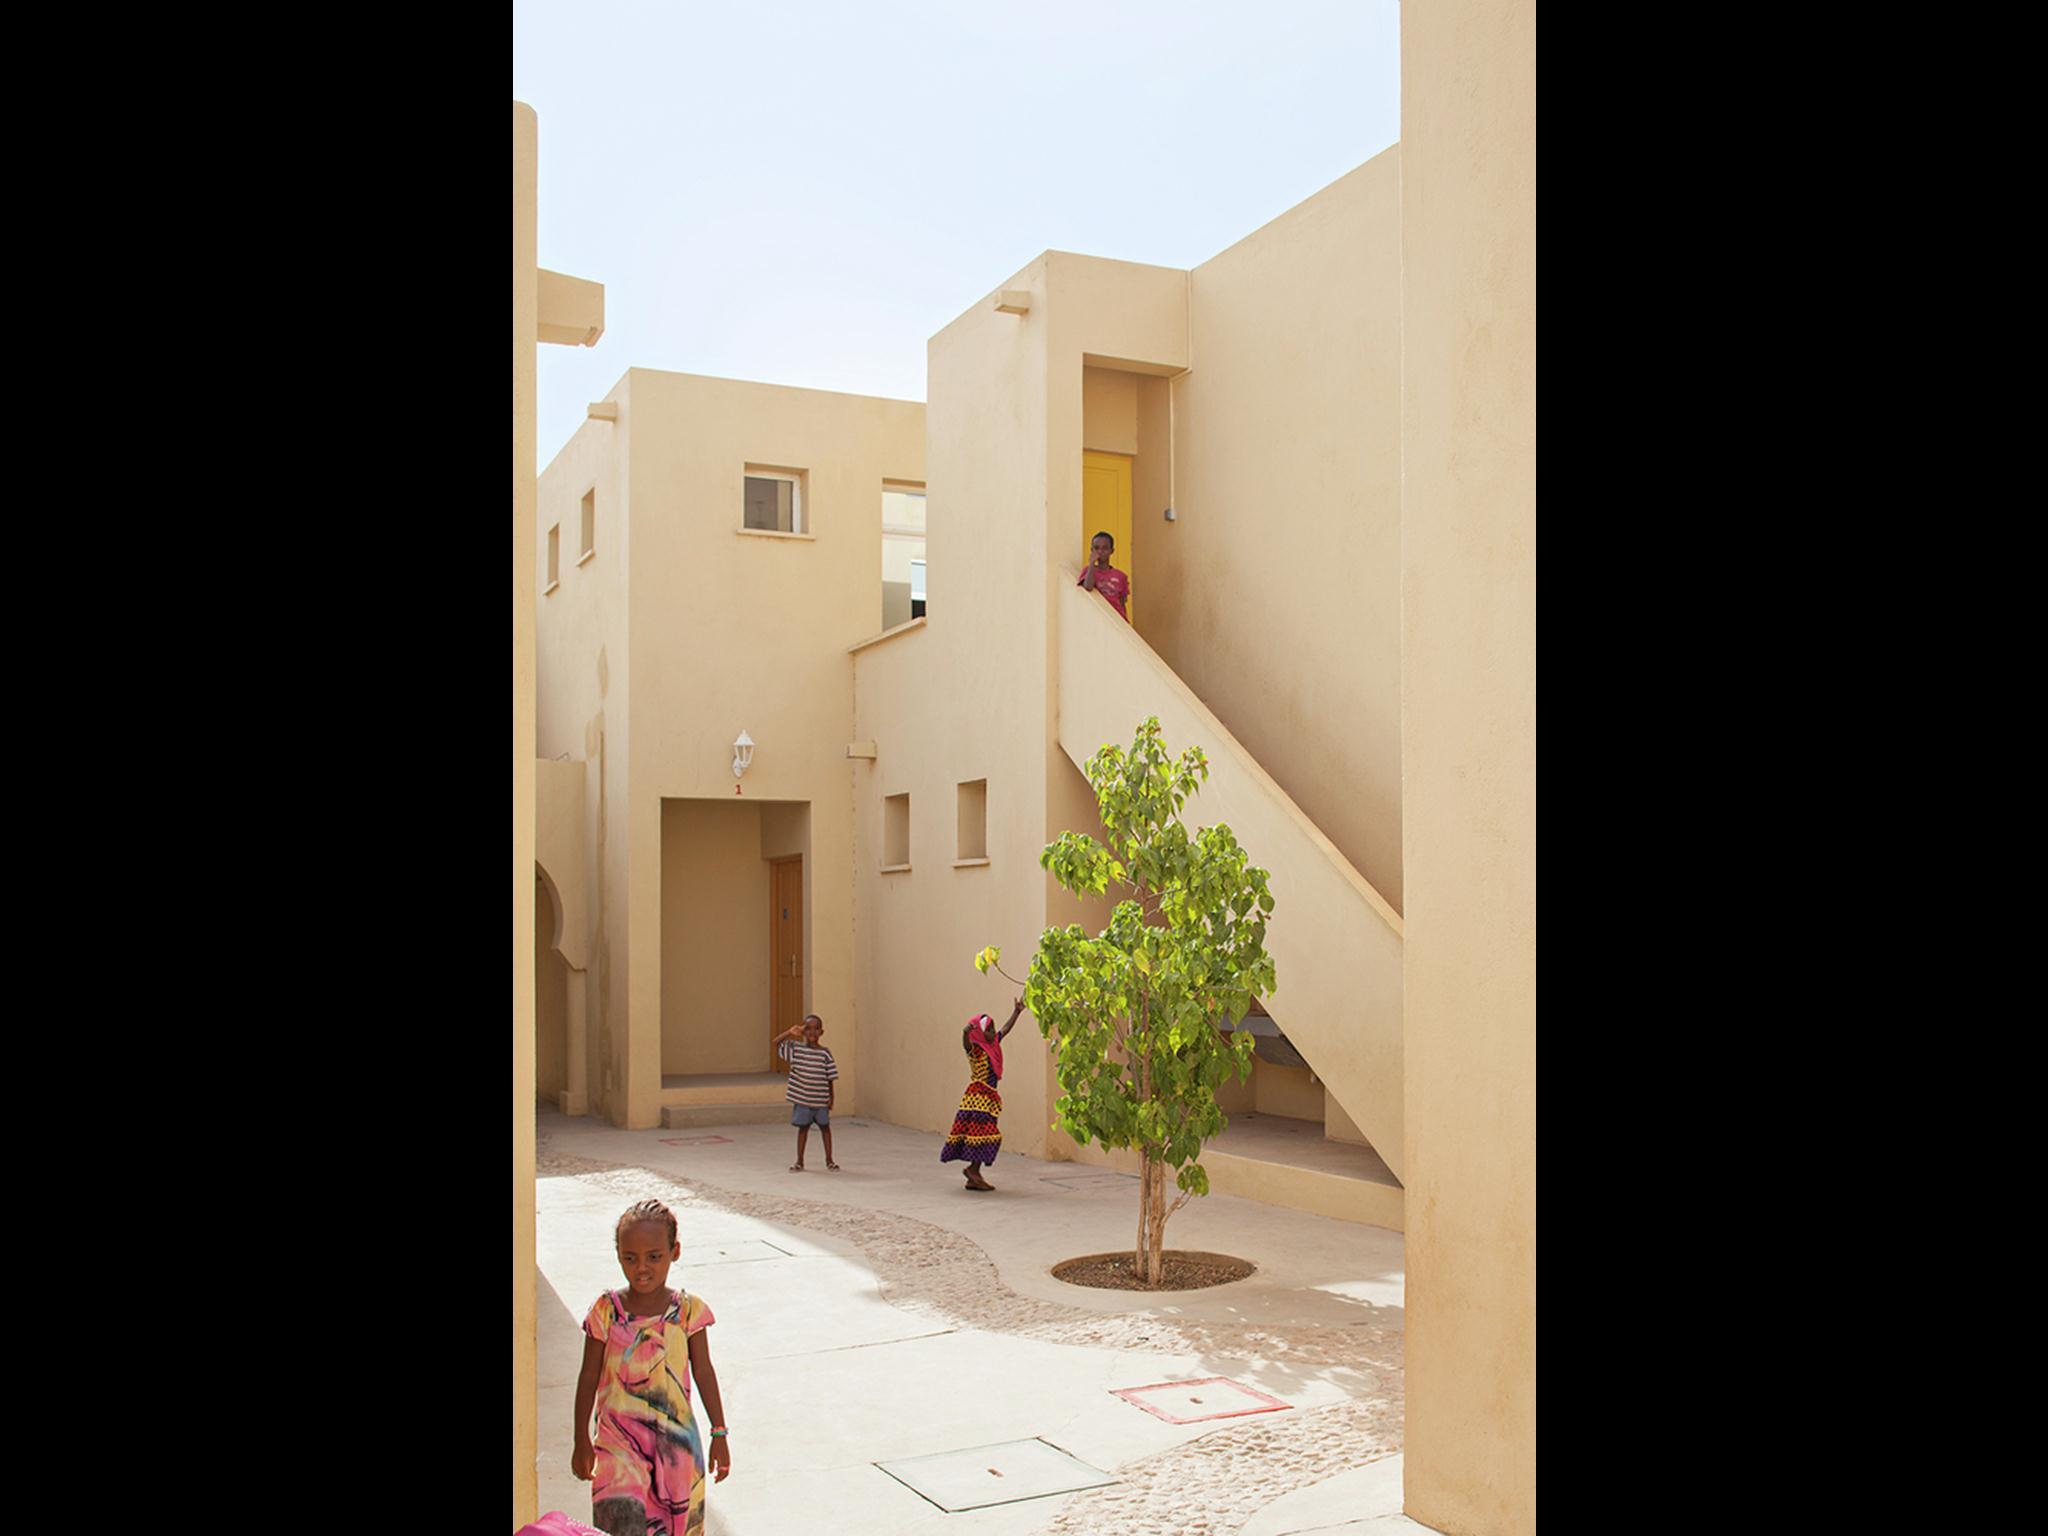 SOS_Village_Djibouti_-_Squares_(17)